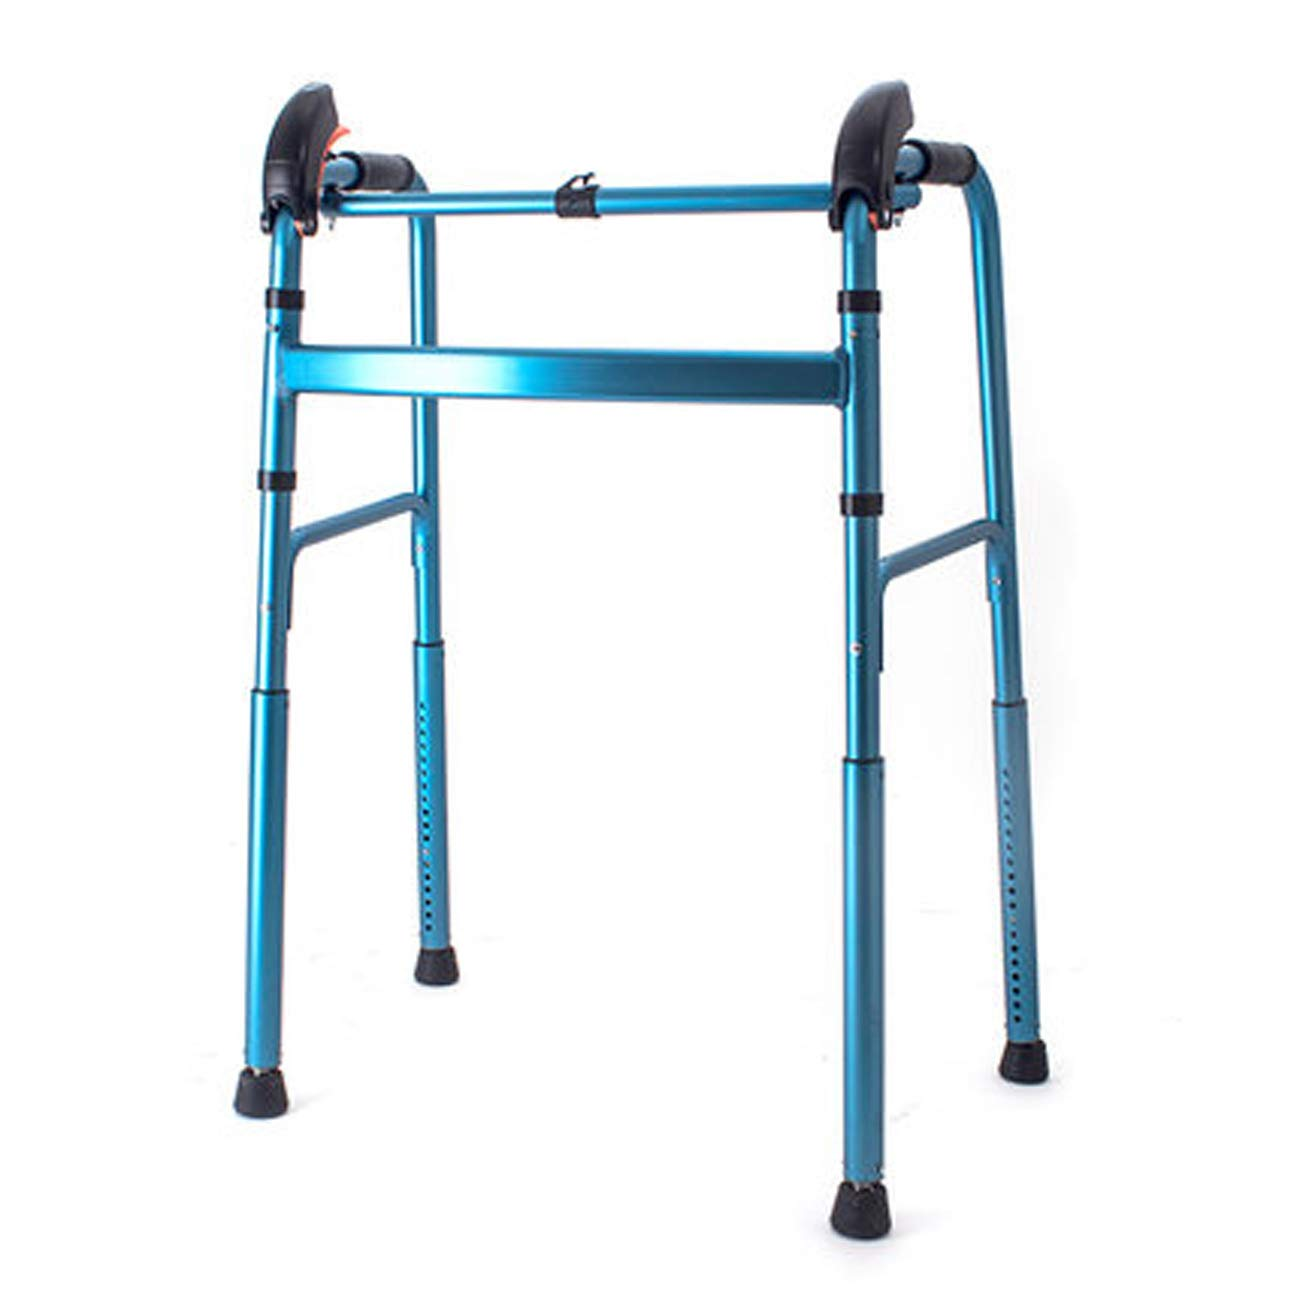 高品質 高齢者歩行器、アルミニウム合金歩行補助具、歩行補助パッド歩行補助具   B07KTXPDCW, sot-web:7bfc667d --- a0267596.xsph.ru